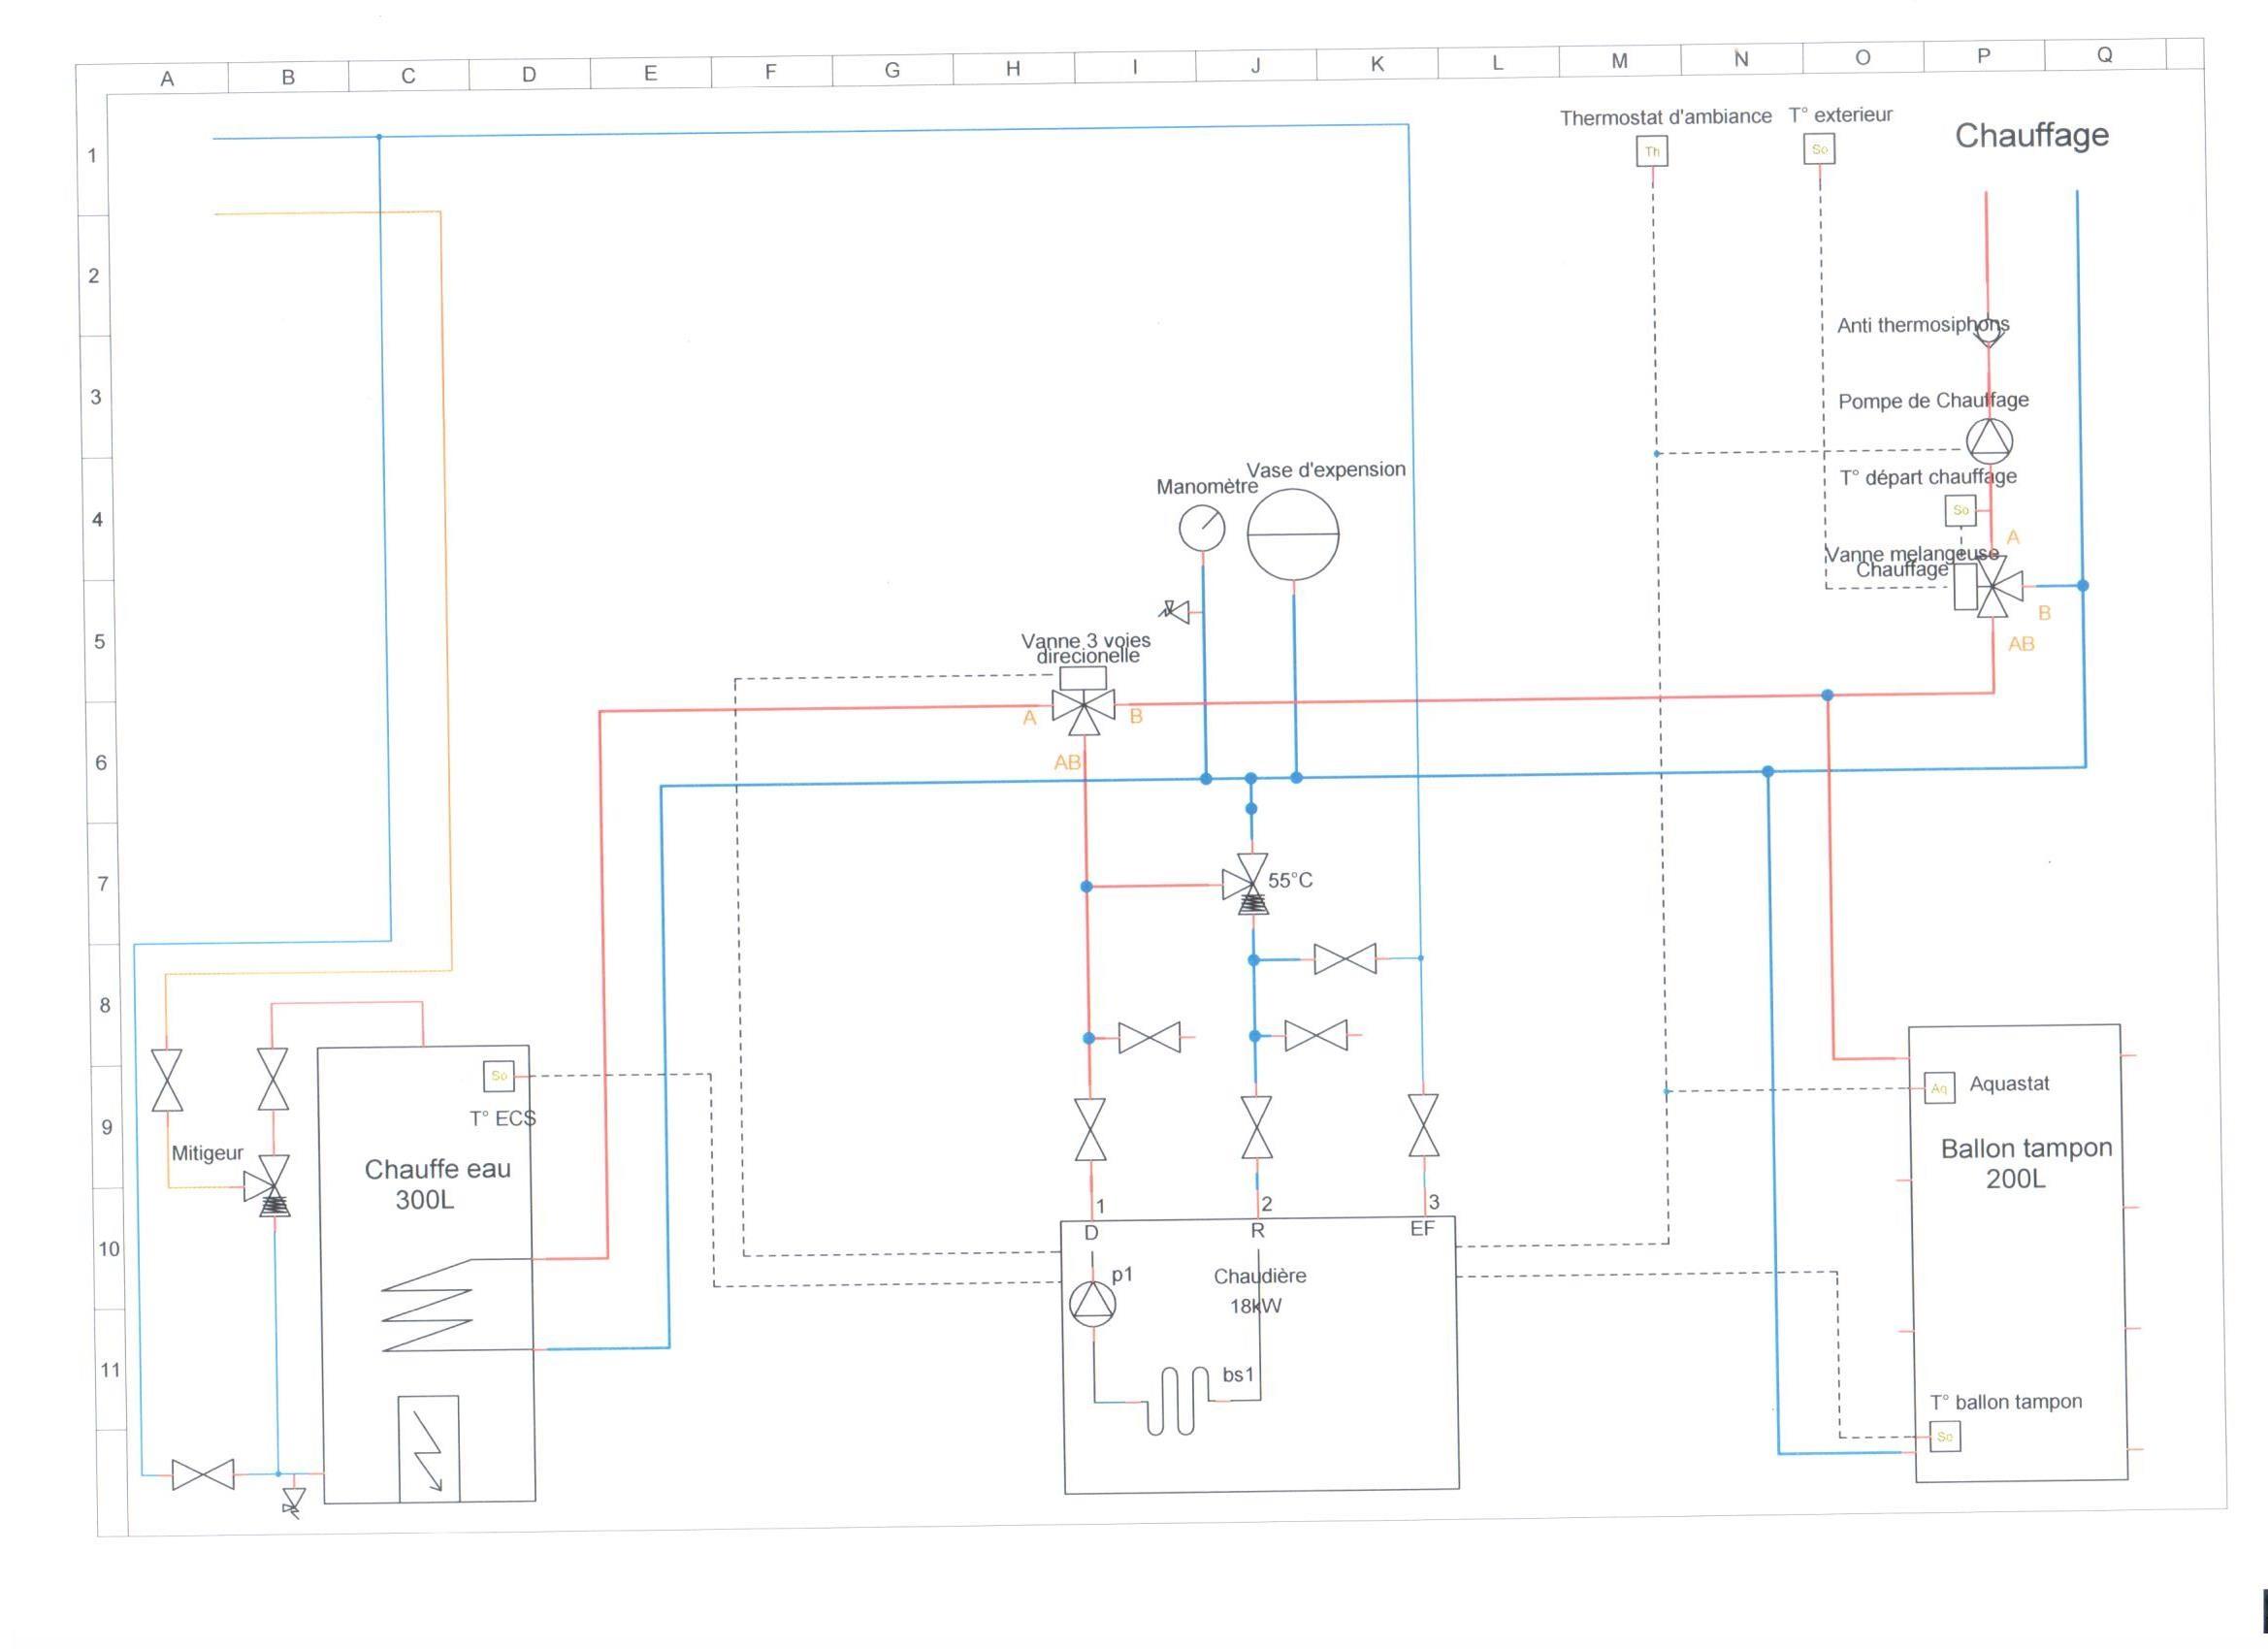 Plan instal.jpg, 266.71 kb, 2338 x 1700